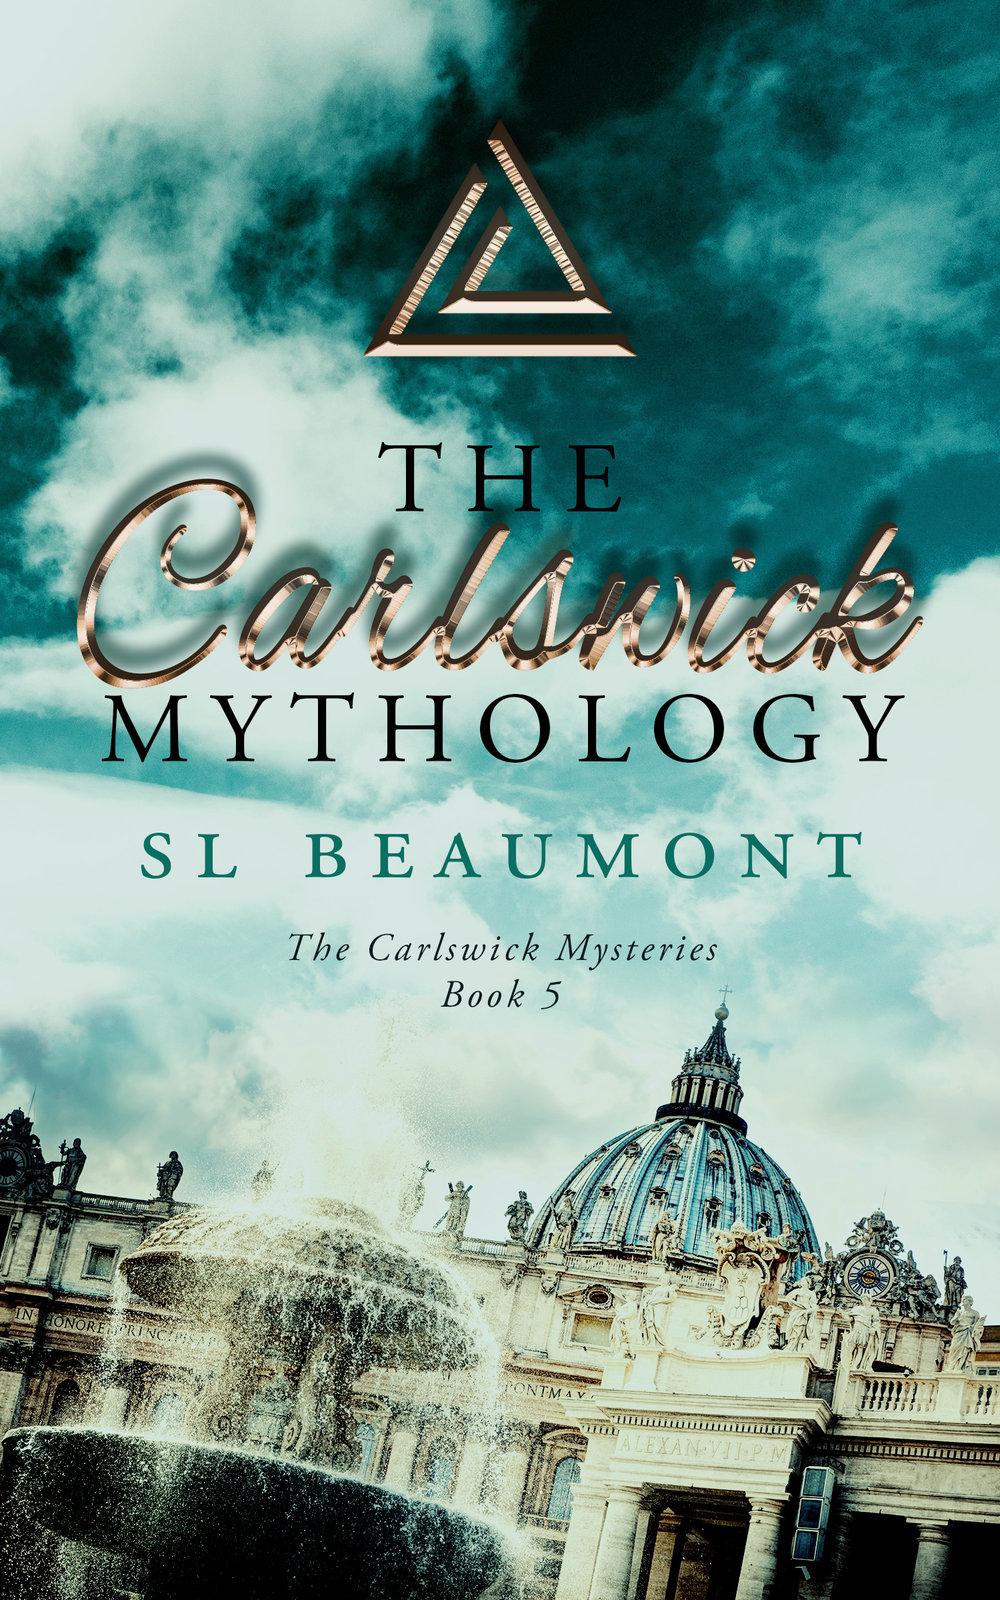 a The Carlswick Mythology_eBcov_B5.jpg